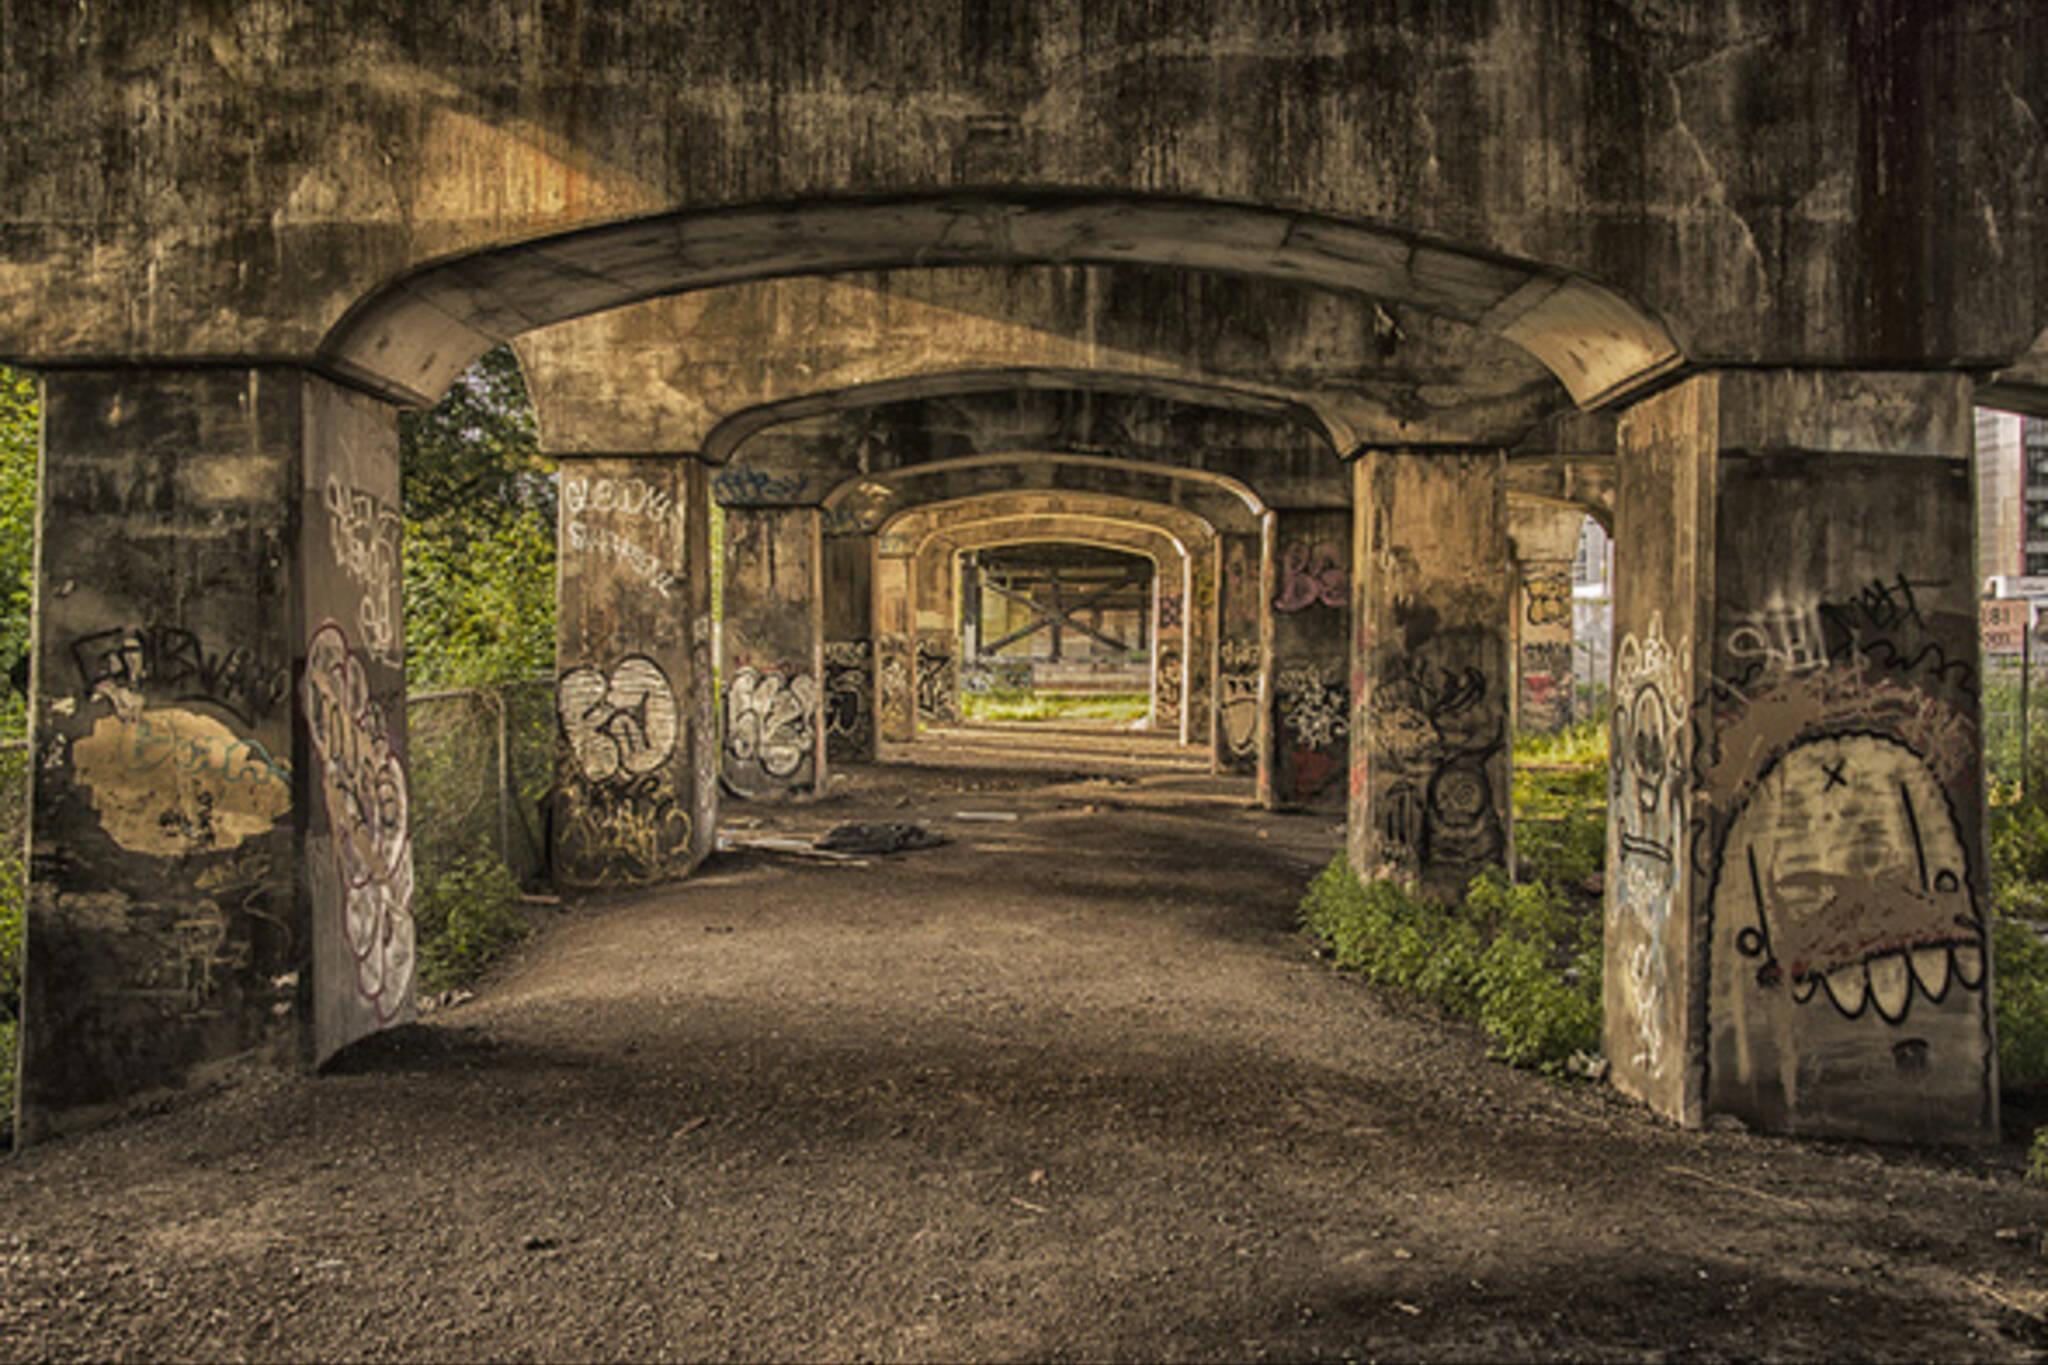 Bathurst Bridge